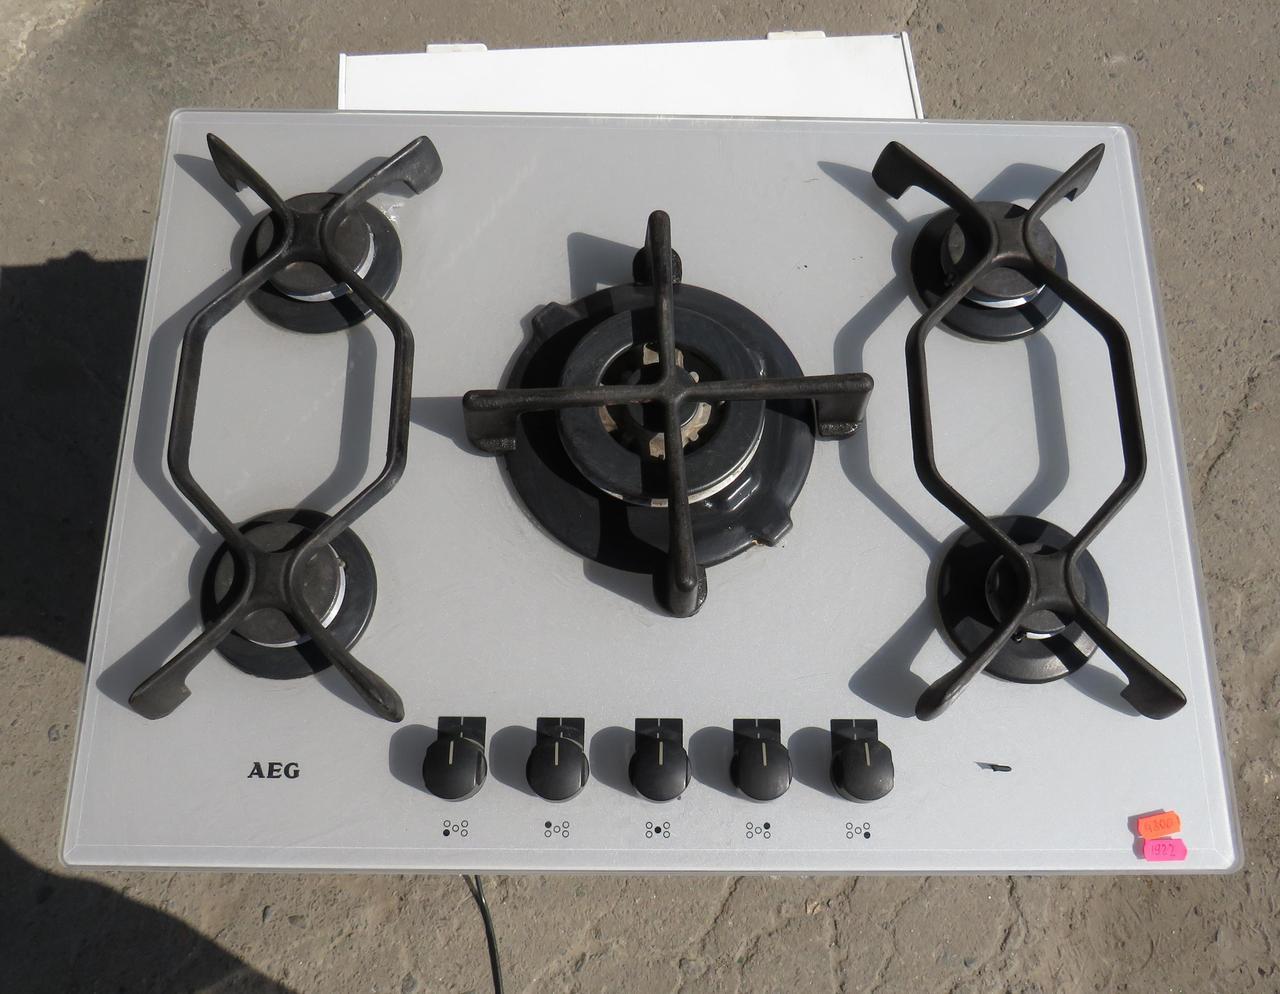 Газовая Варочная Поверхность AEG 95764 G-M (Код:1922) Состояние: Б/У